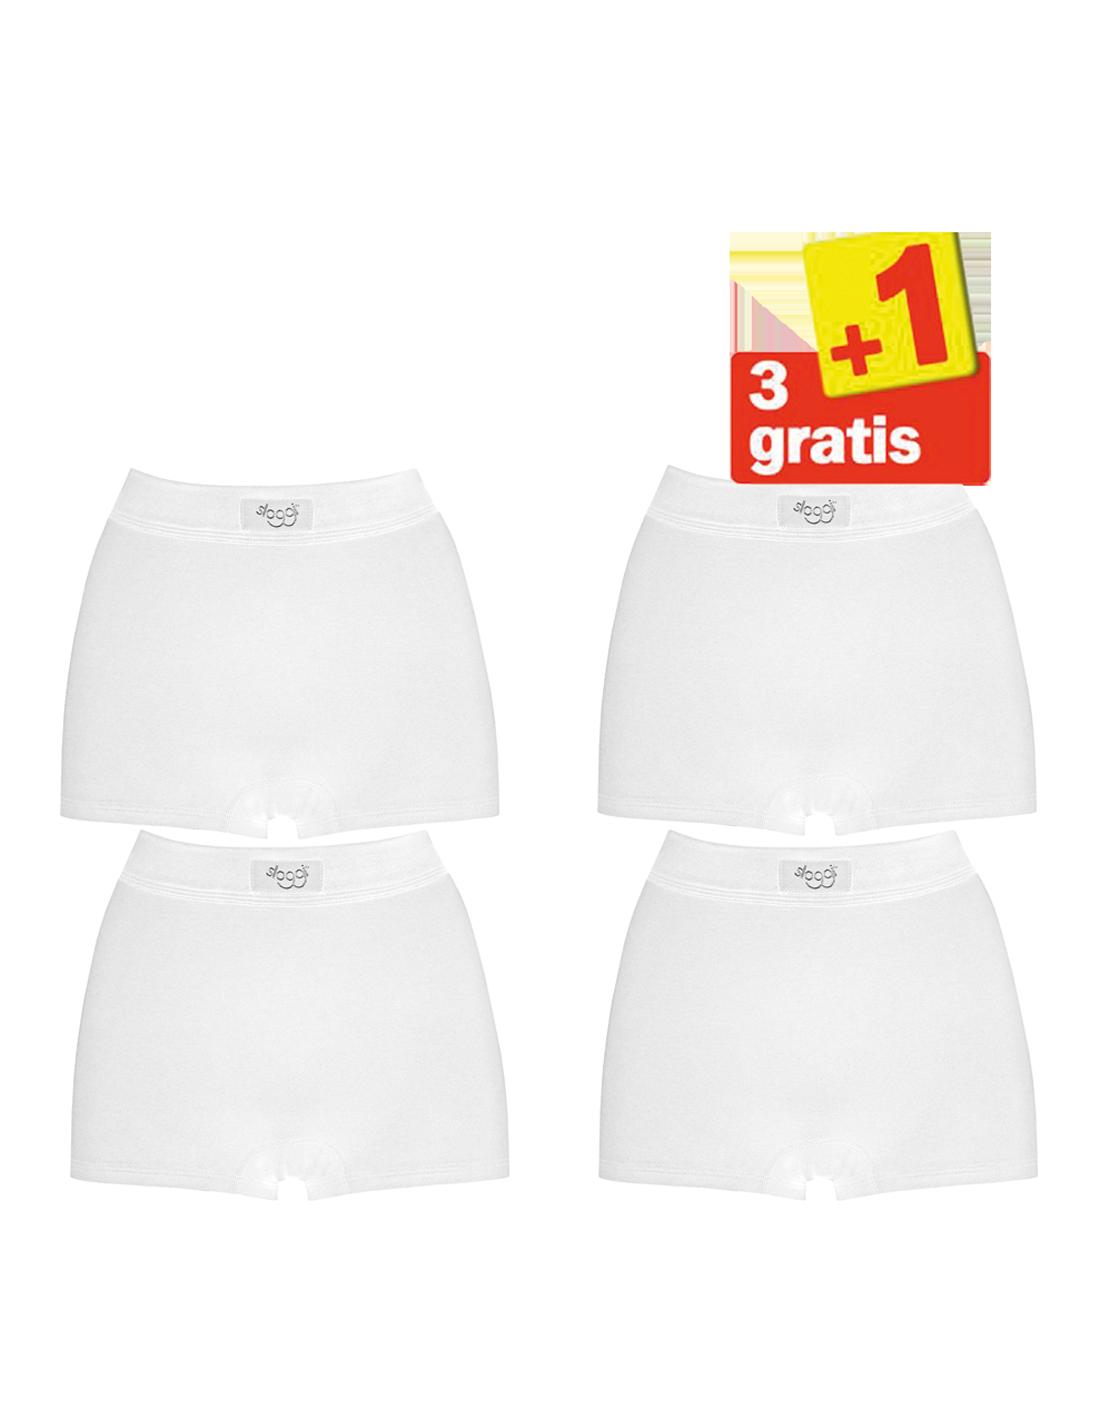 e524005f608 Sloggi Double Comfort Short 4 pack Wit 3+1 Gratis